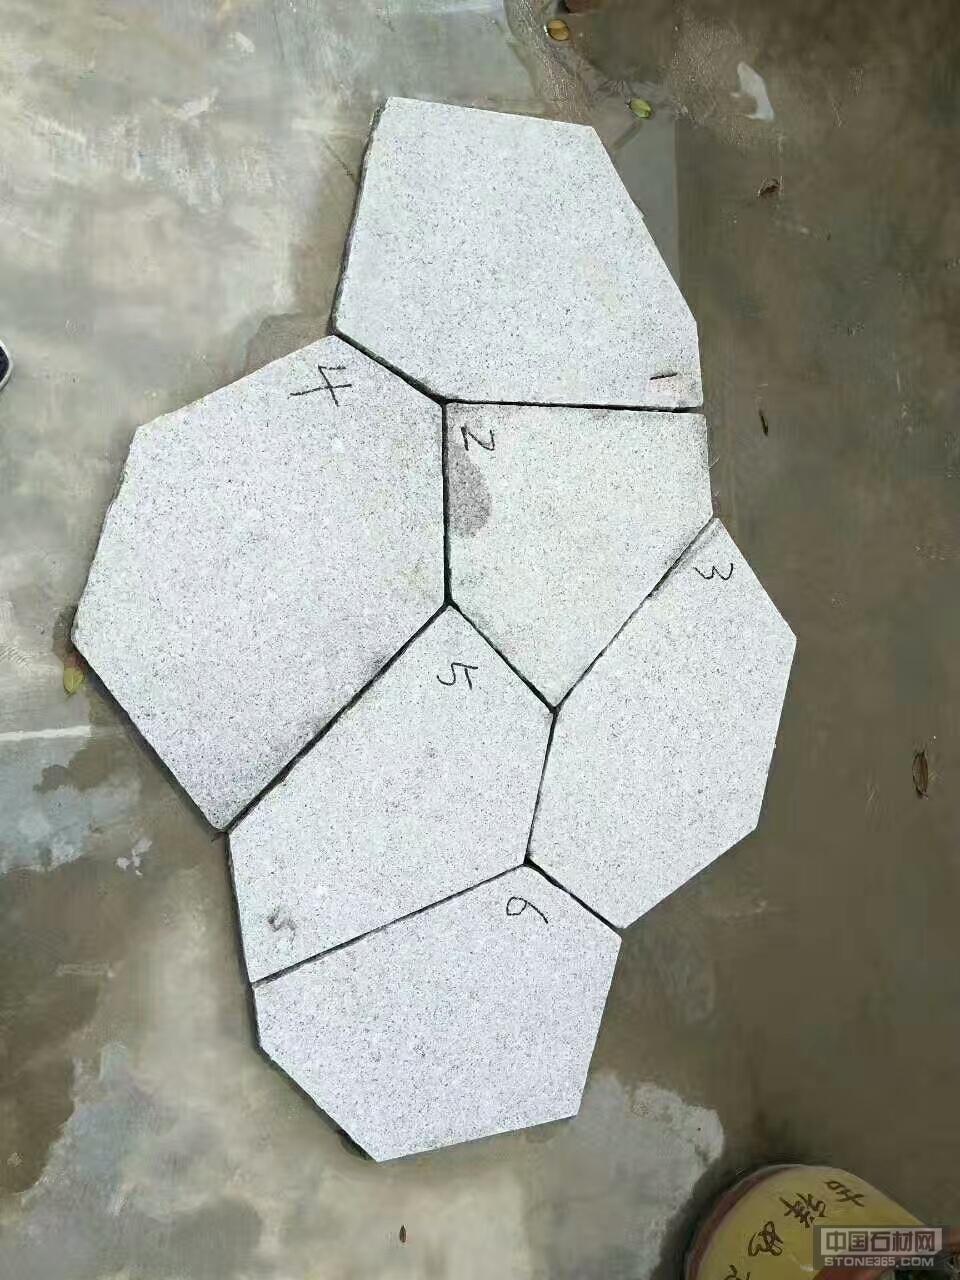 锈石冰裂纹